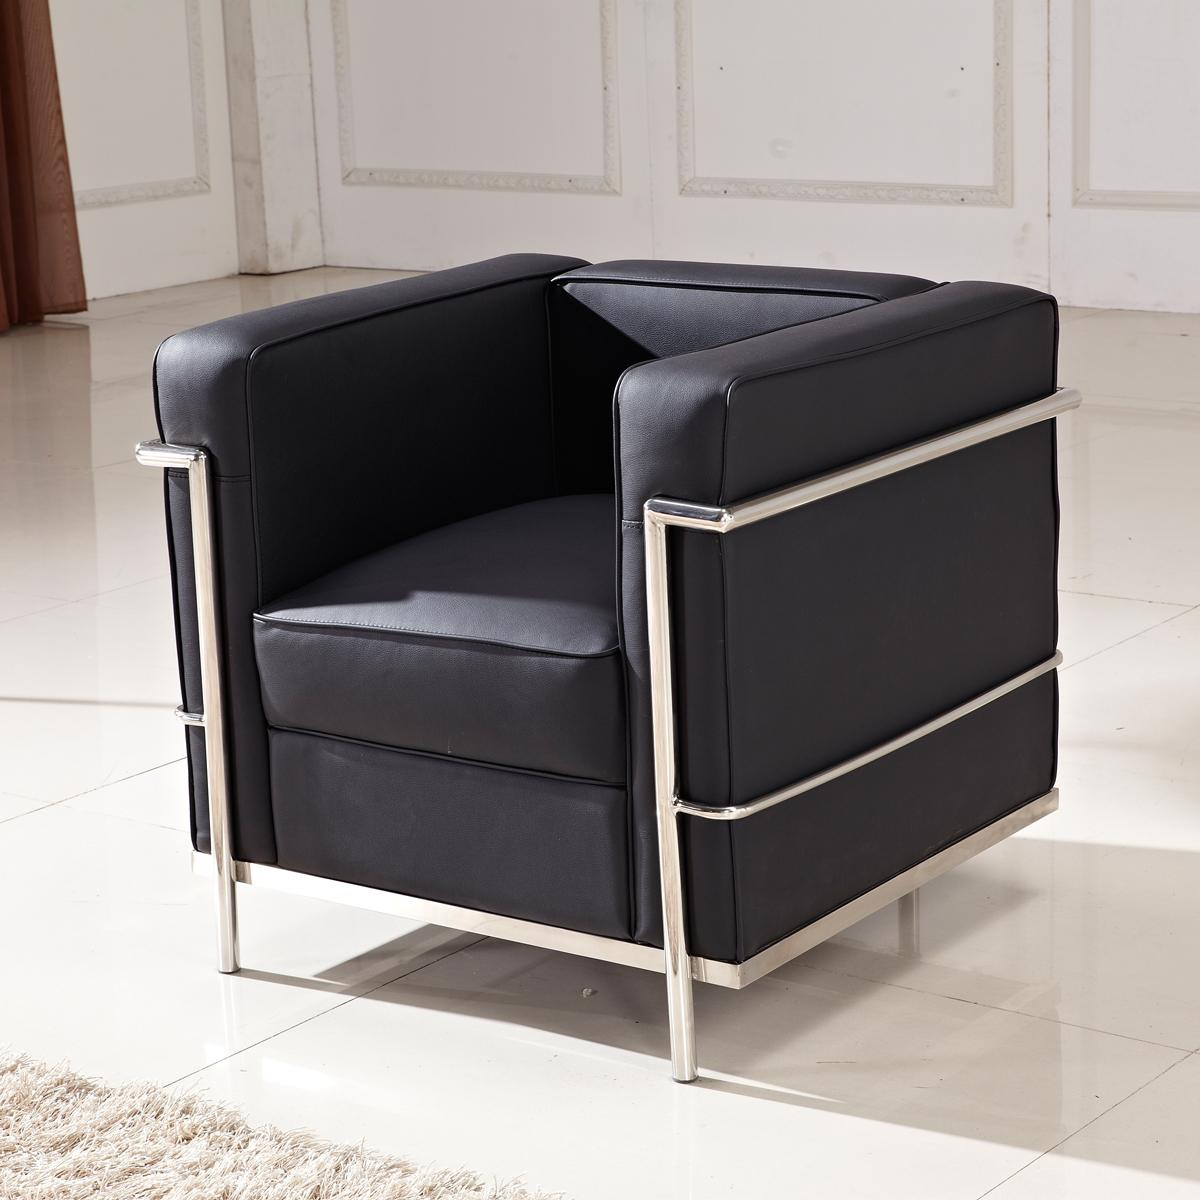 Großhandel Le Corbusier Lc2 Petit Comfort Sofa Stuhl, Echtes Leder ...